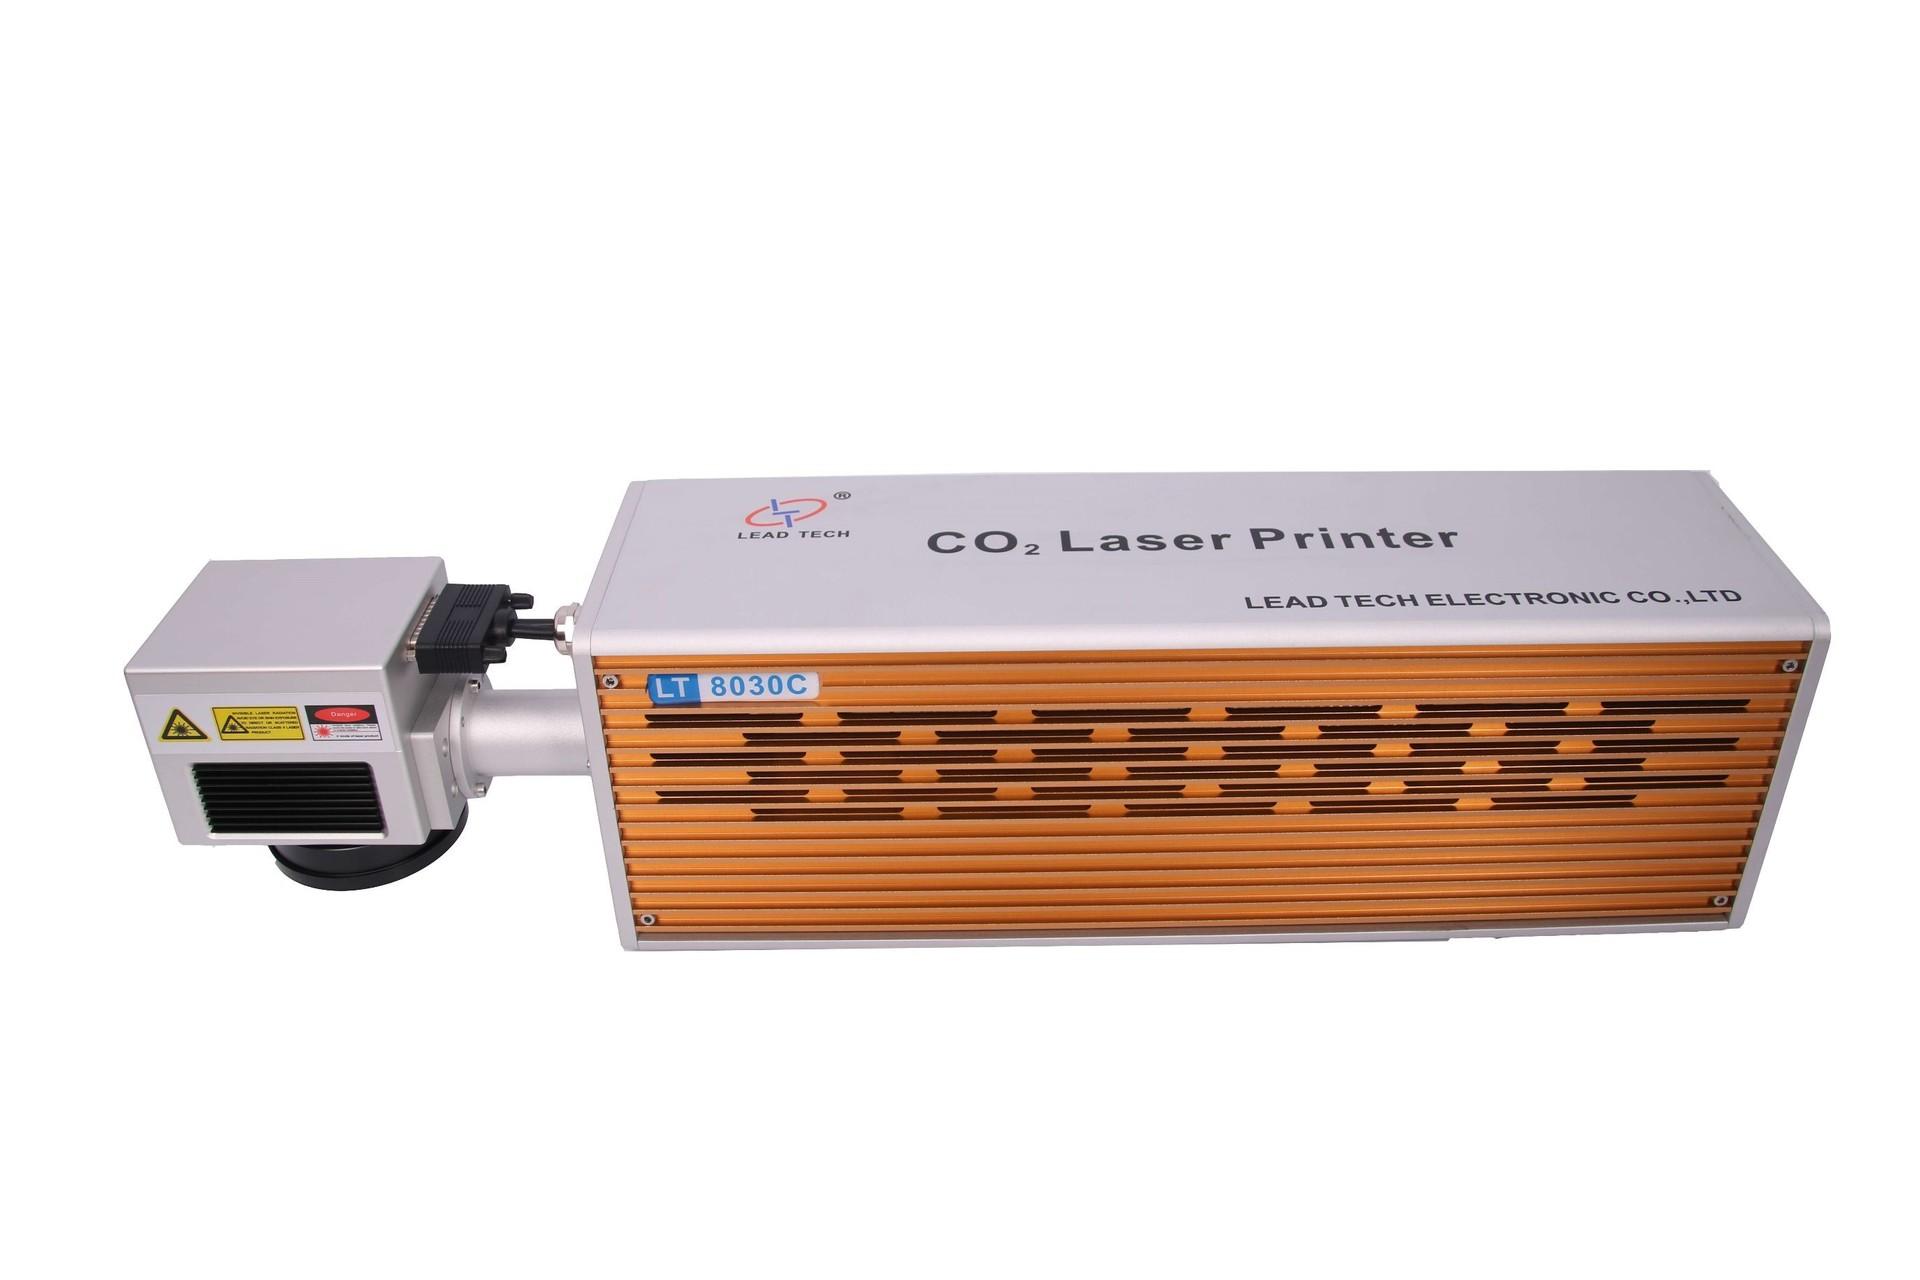 Lead Tech Lt8020c/Lt8030c CO2 20W/30W Style Digital Barcode Laser Printer